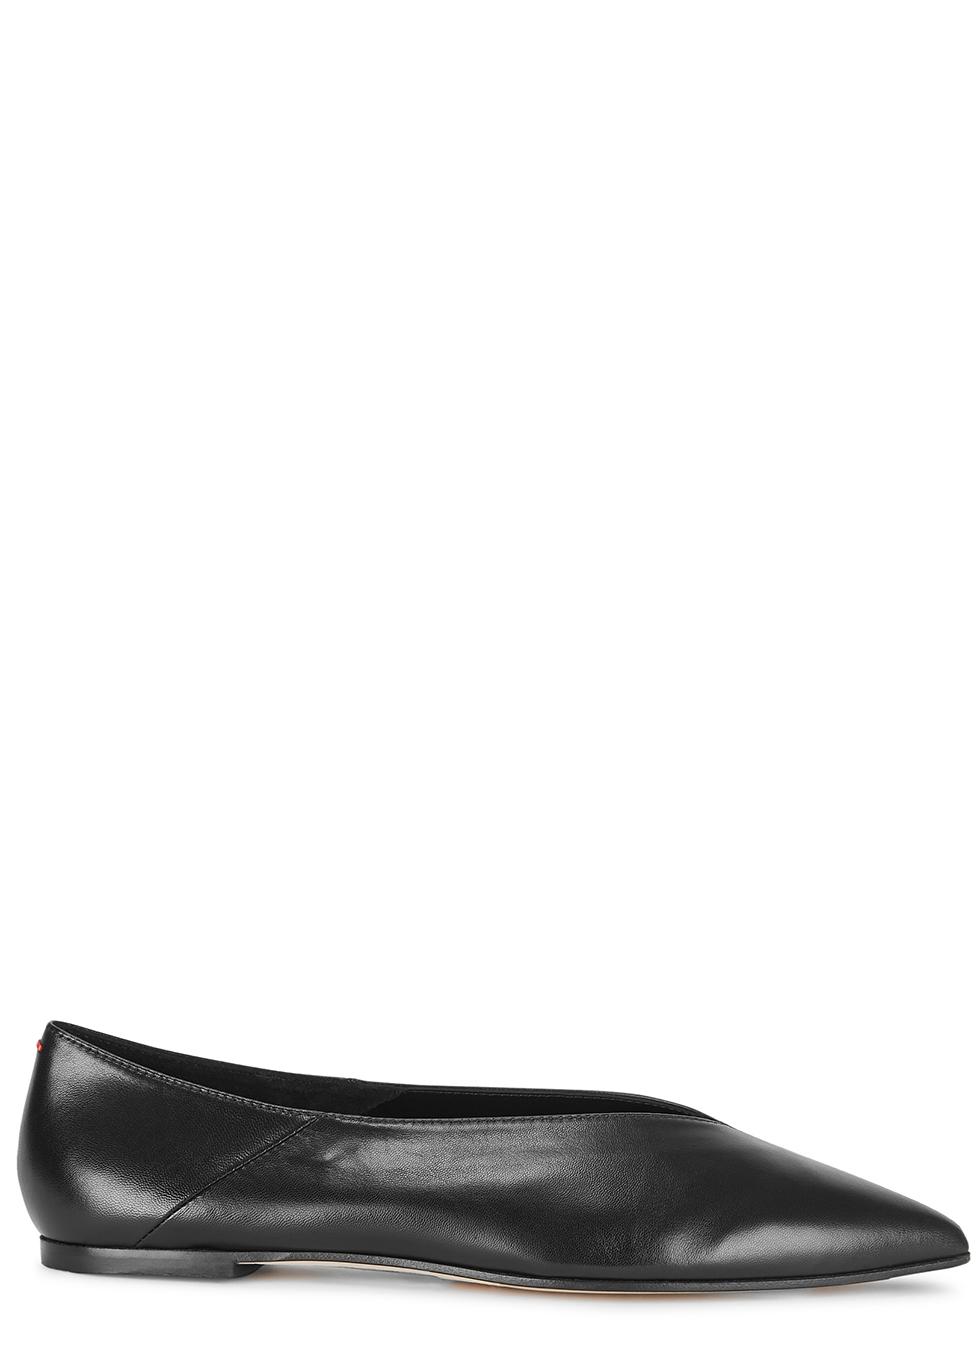 aeyde Moa black leather flats - Harvey